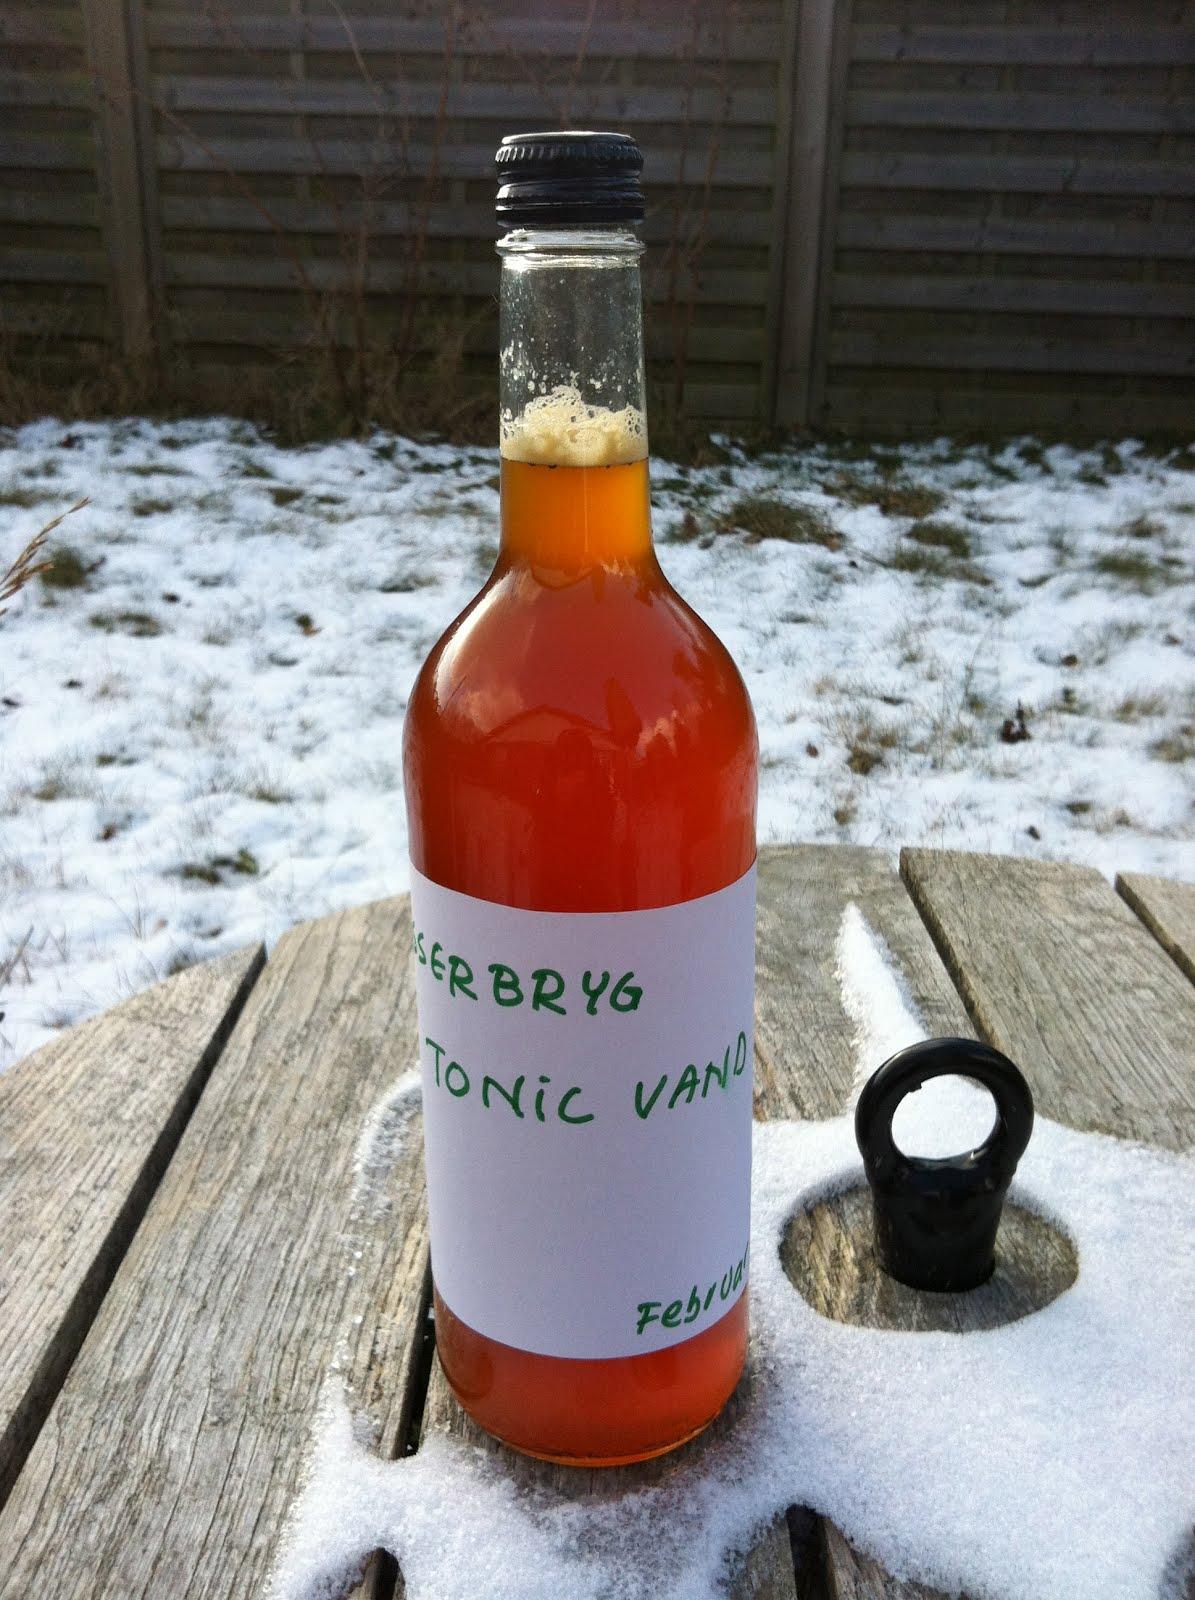 hjemmelavet sodavand opskrift